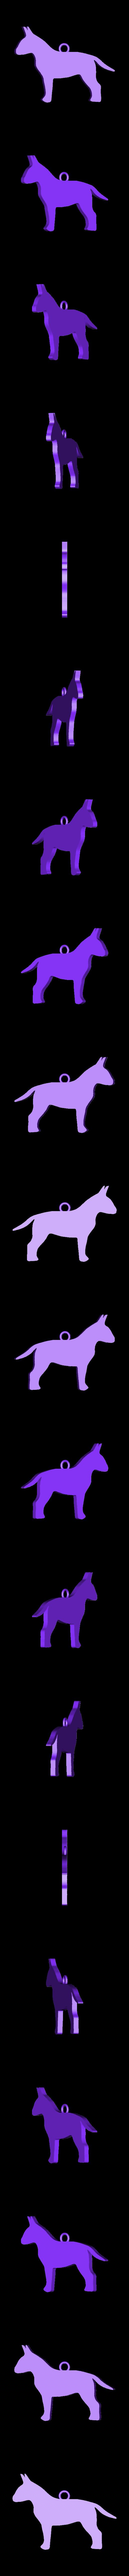 35.stl Download STL file Dogs • 3D printing object, GENNADI3313